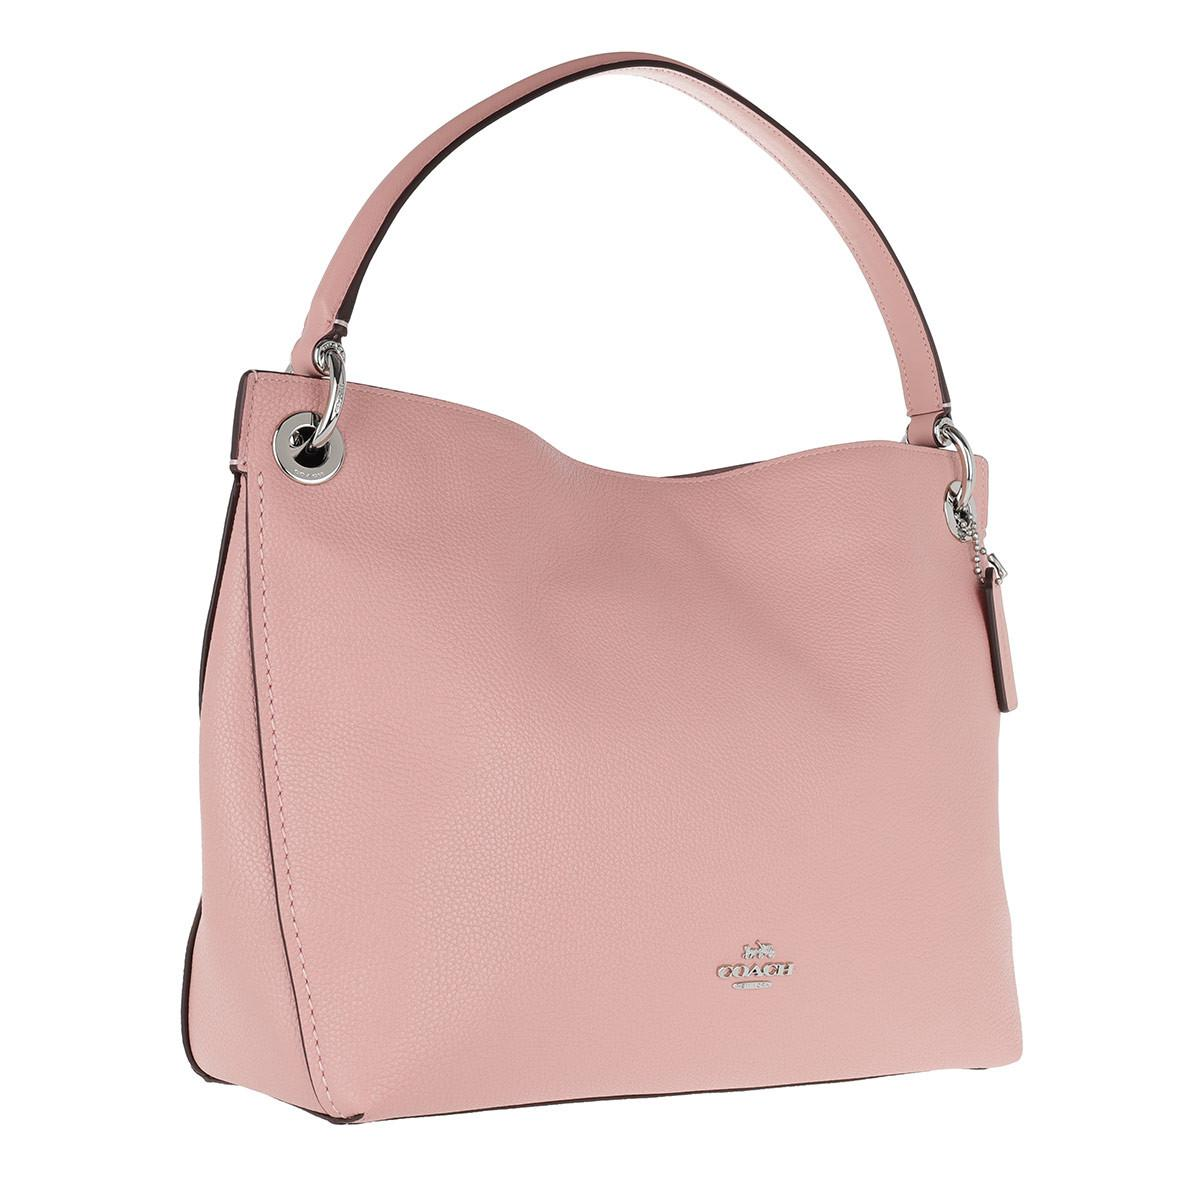 Hobo Bags - Polished Leather Clarkson Hobo Bag Saddle - cognac - Hobo Bags for ladies Coach trJxcD